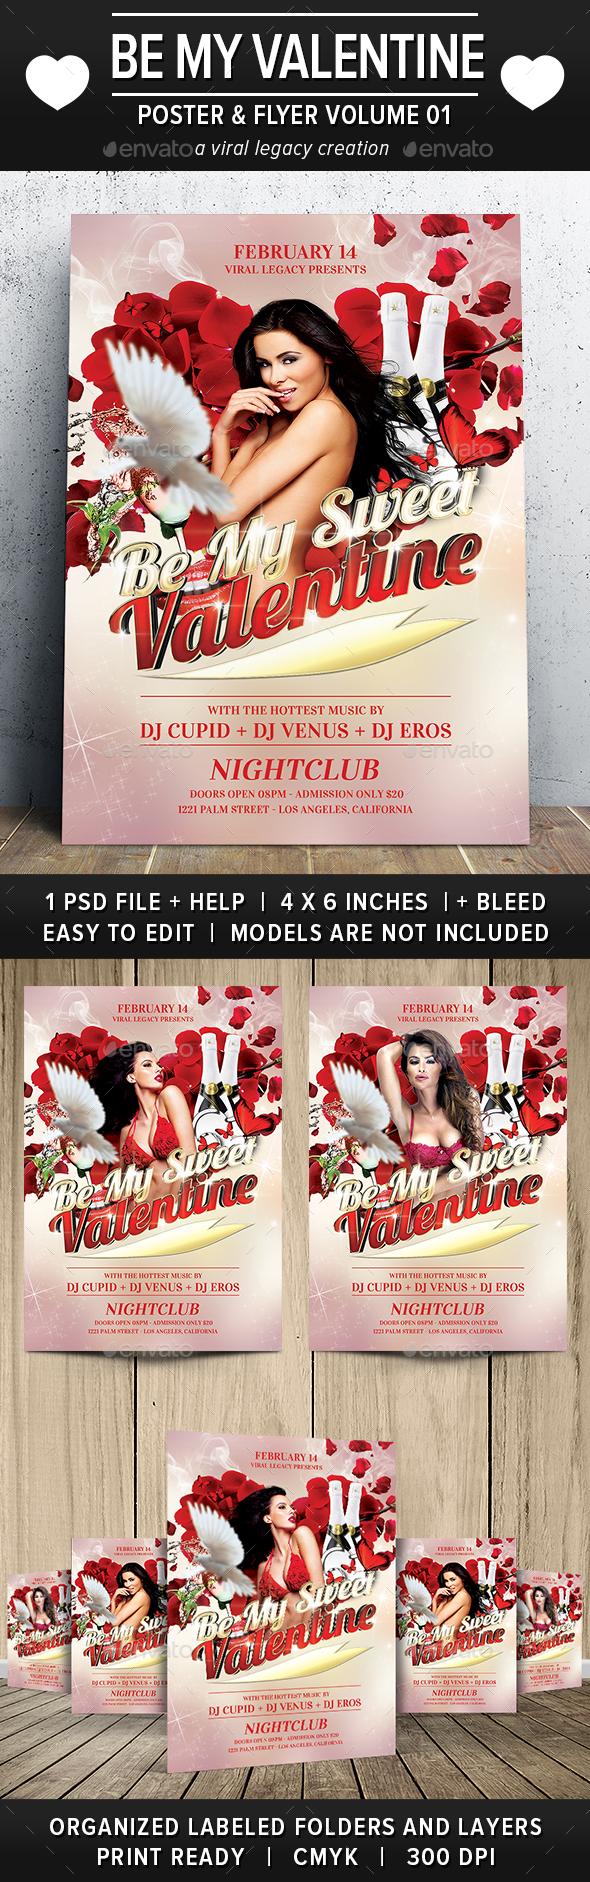 Be My Valentine Flyer V01 - Flyers Print Templates